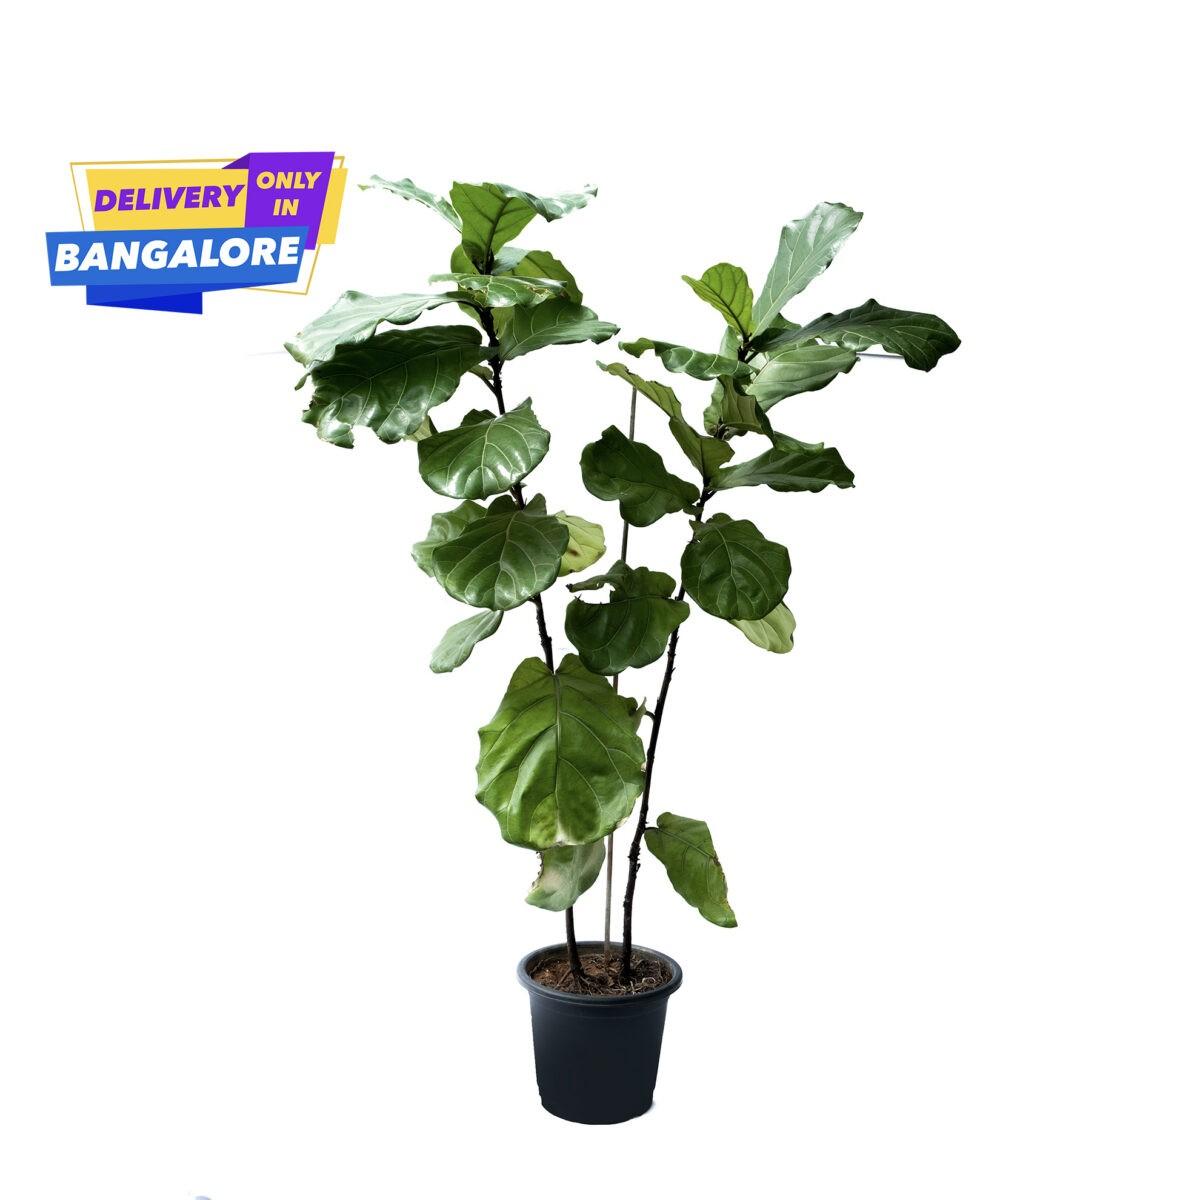 Fiddle Leaf Fig Plant in Bangalore Plant Shop Near